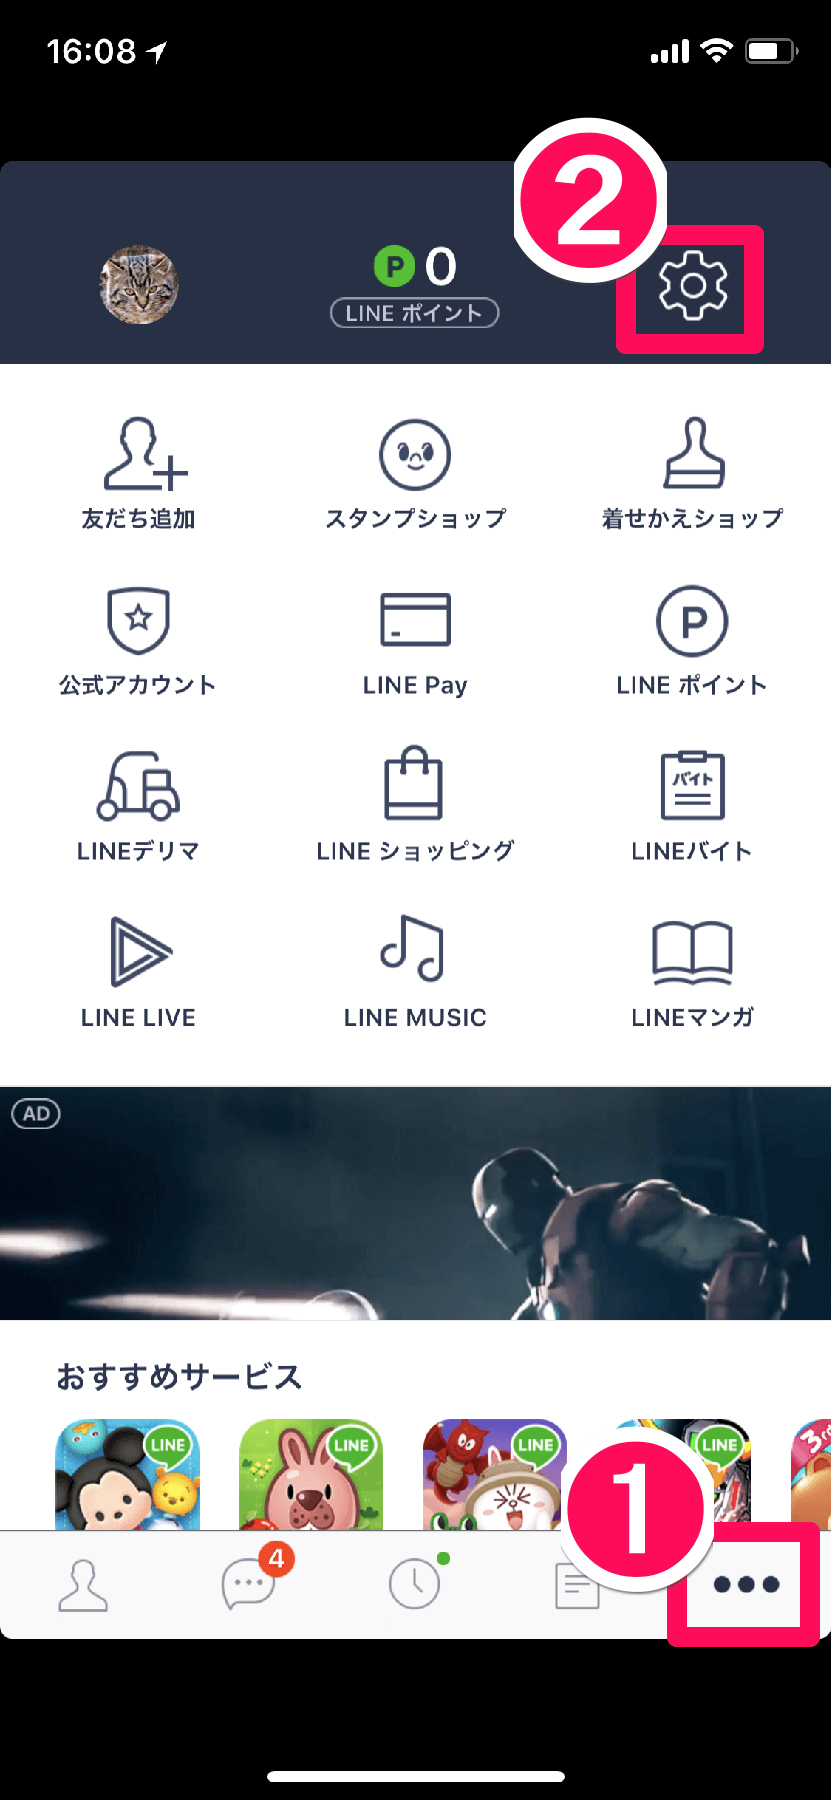 LINE(ライン)のメイン画面